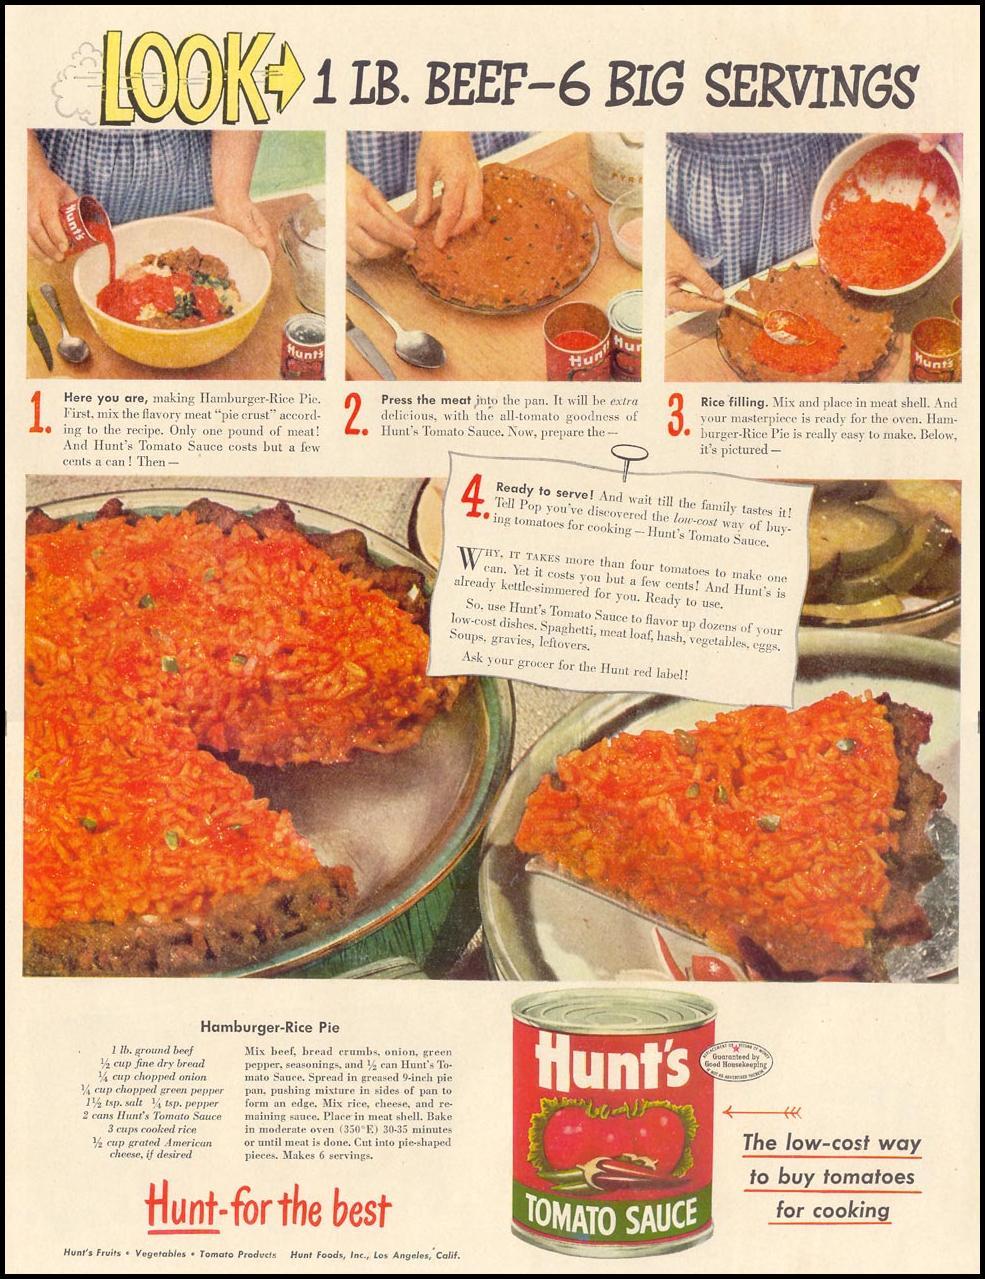 HUNT'S TOMATO SAUCE LIFE 11/15/1948